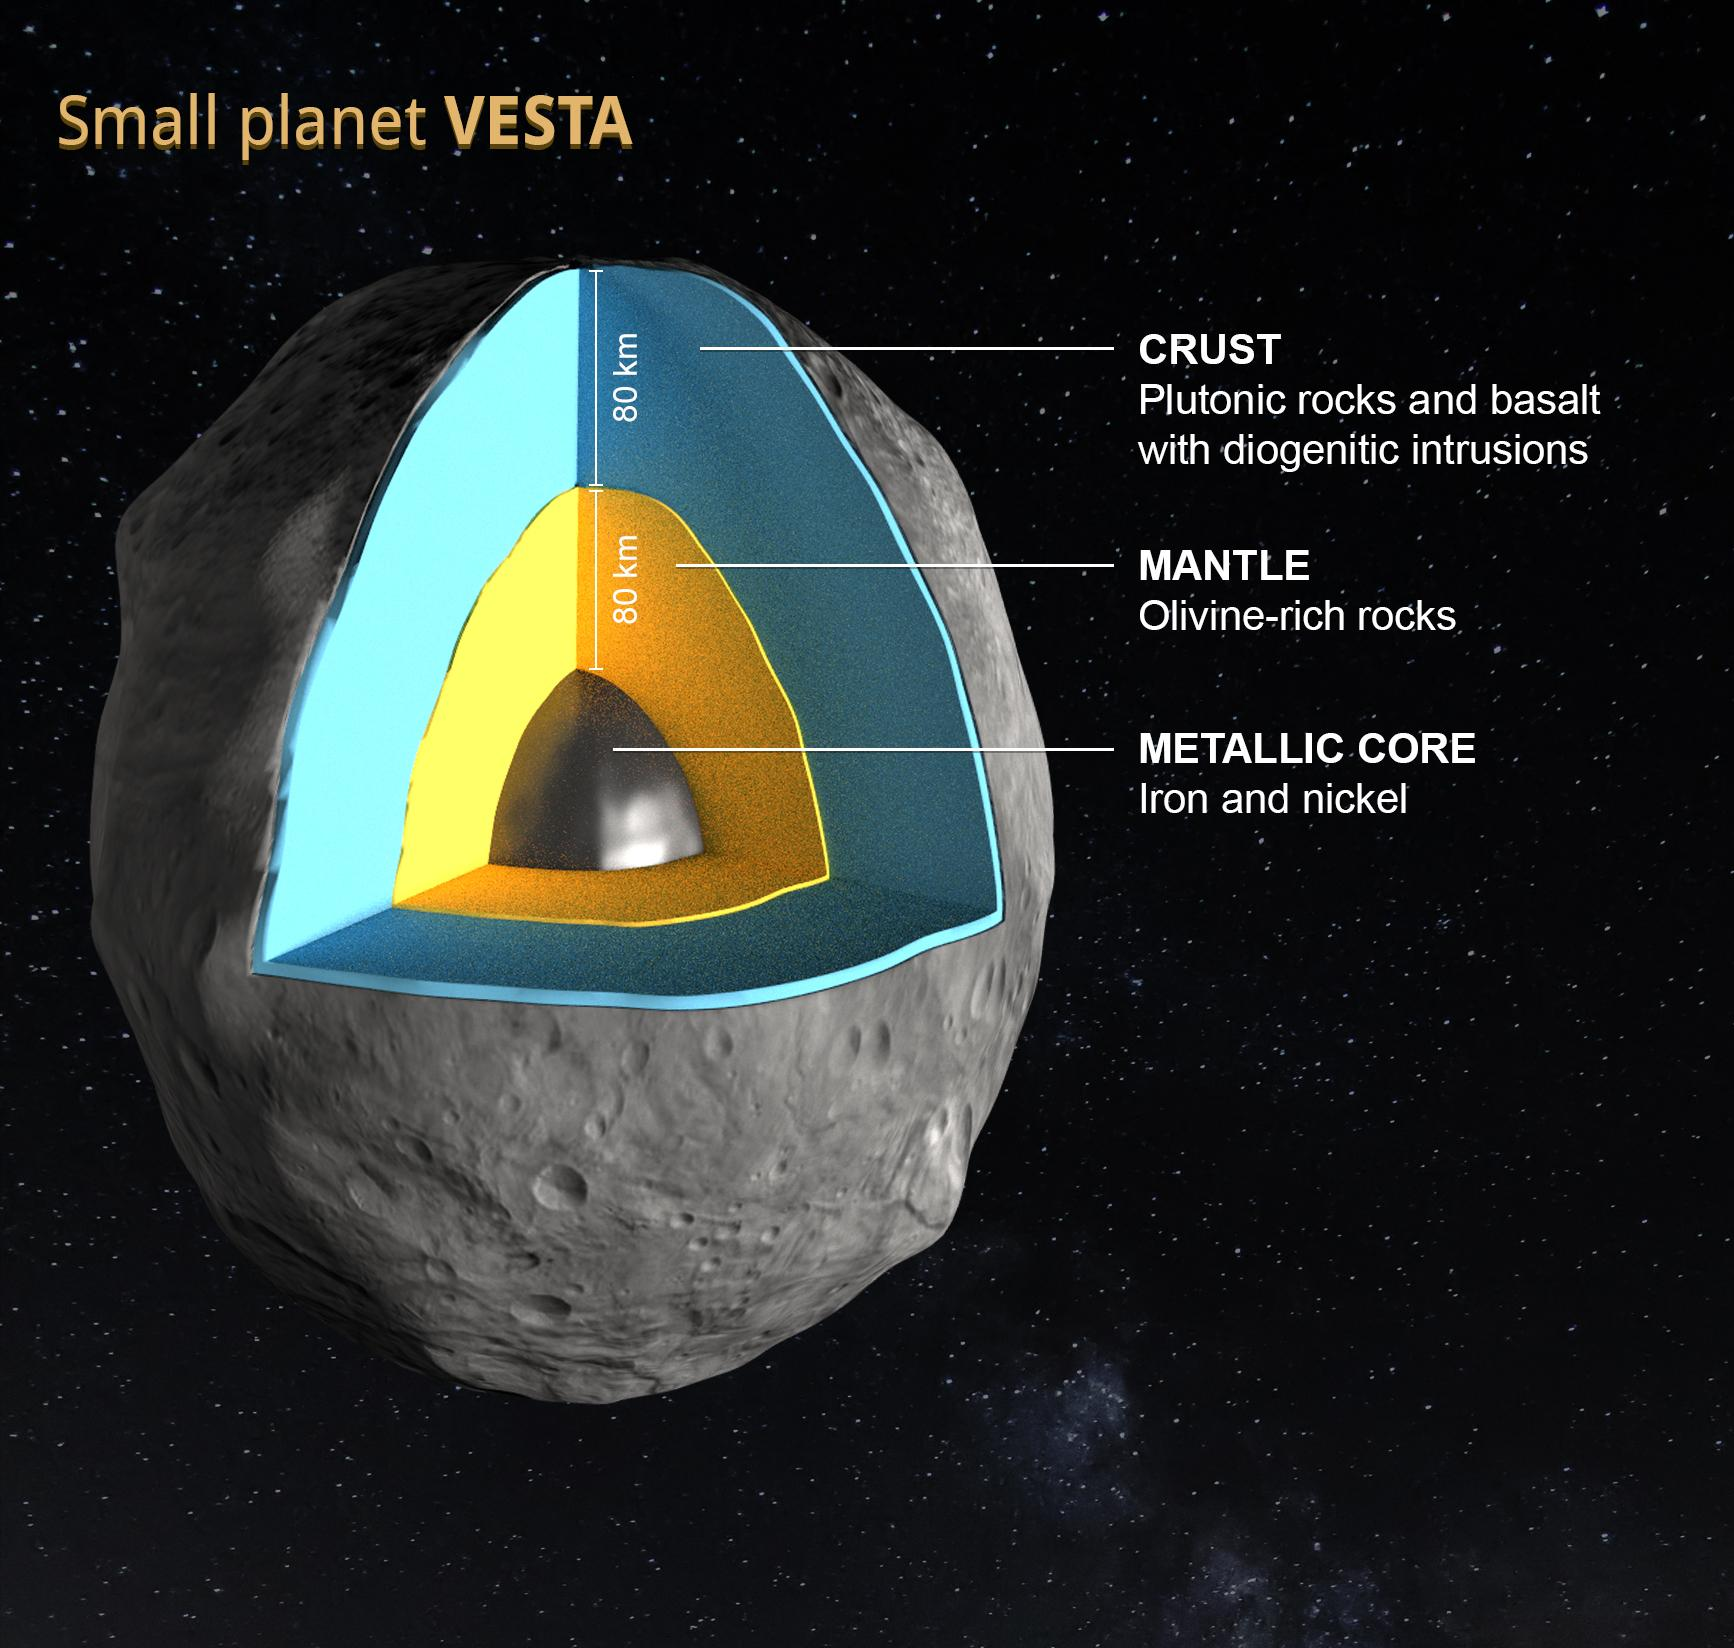 estructura interna del planeta enano Vesta